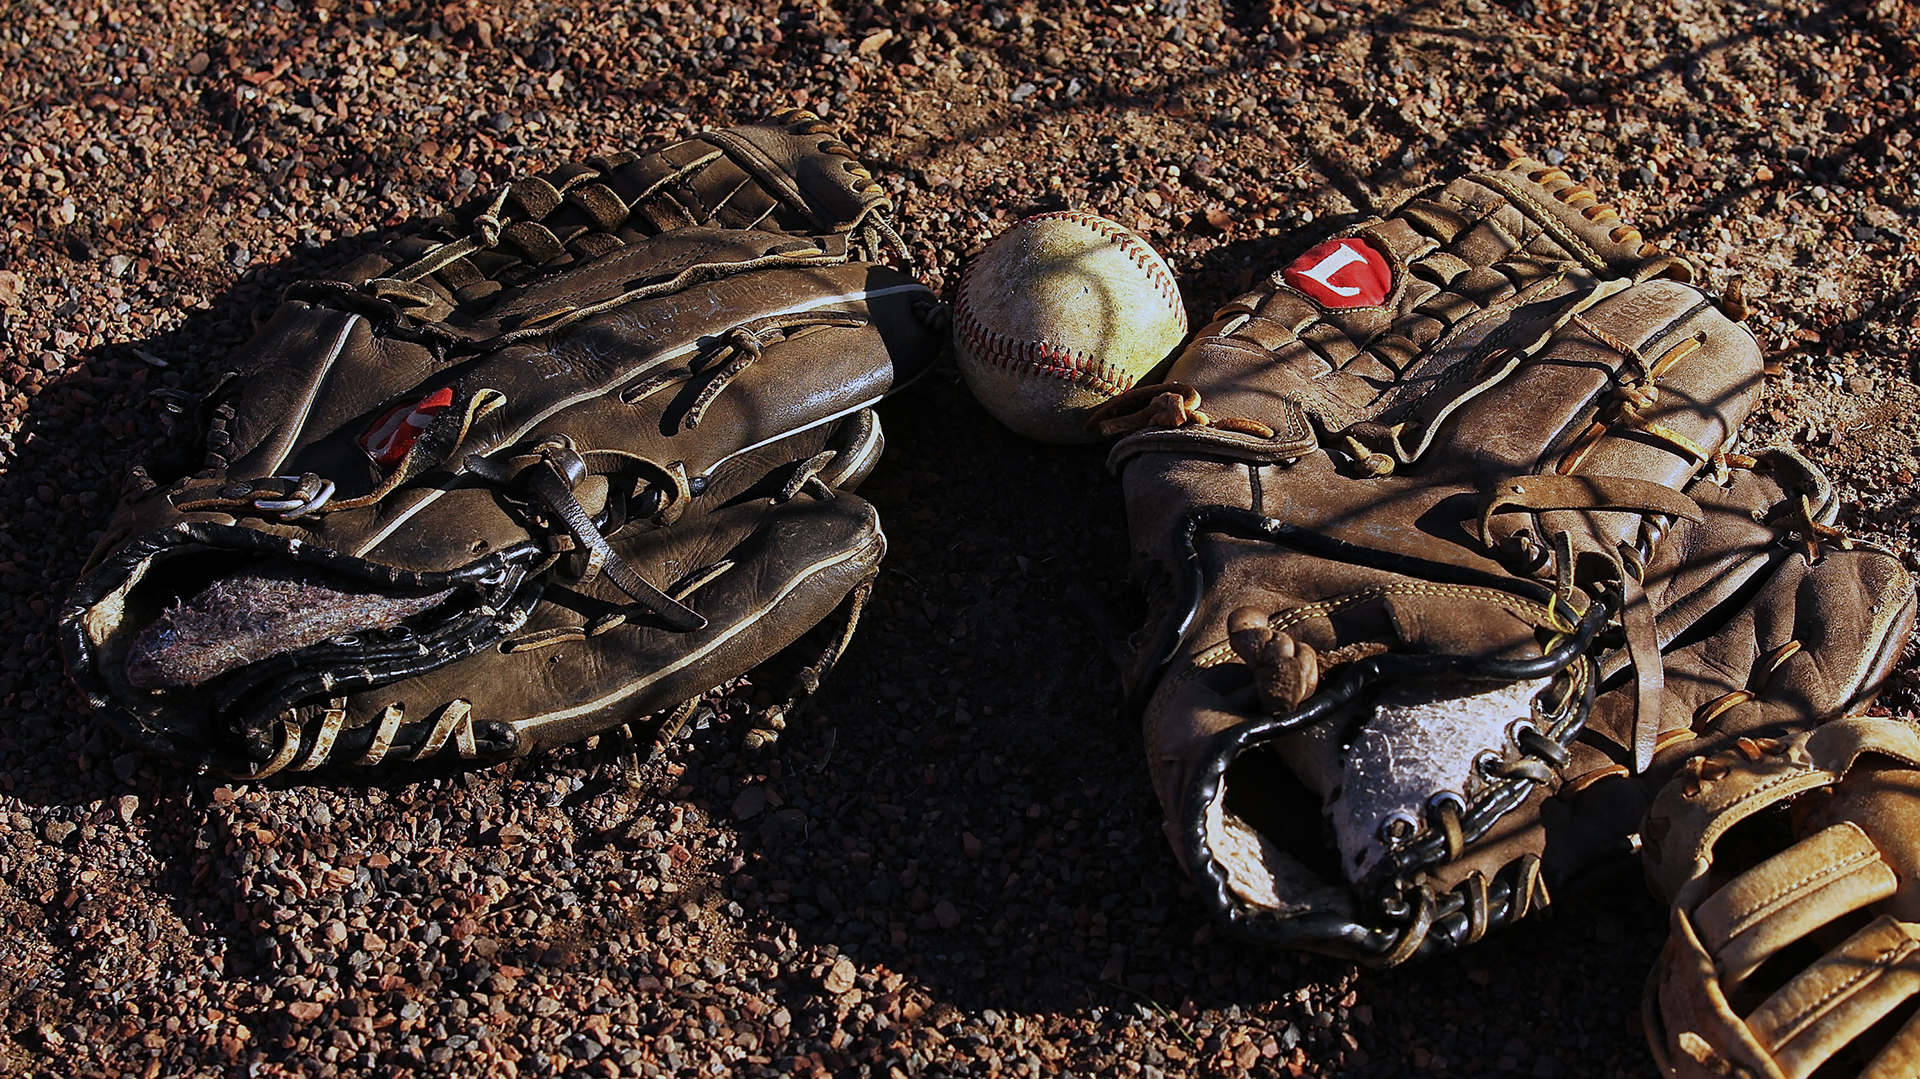 Baseball glove and ball generic-159532.jpg03353736